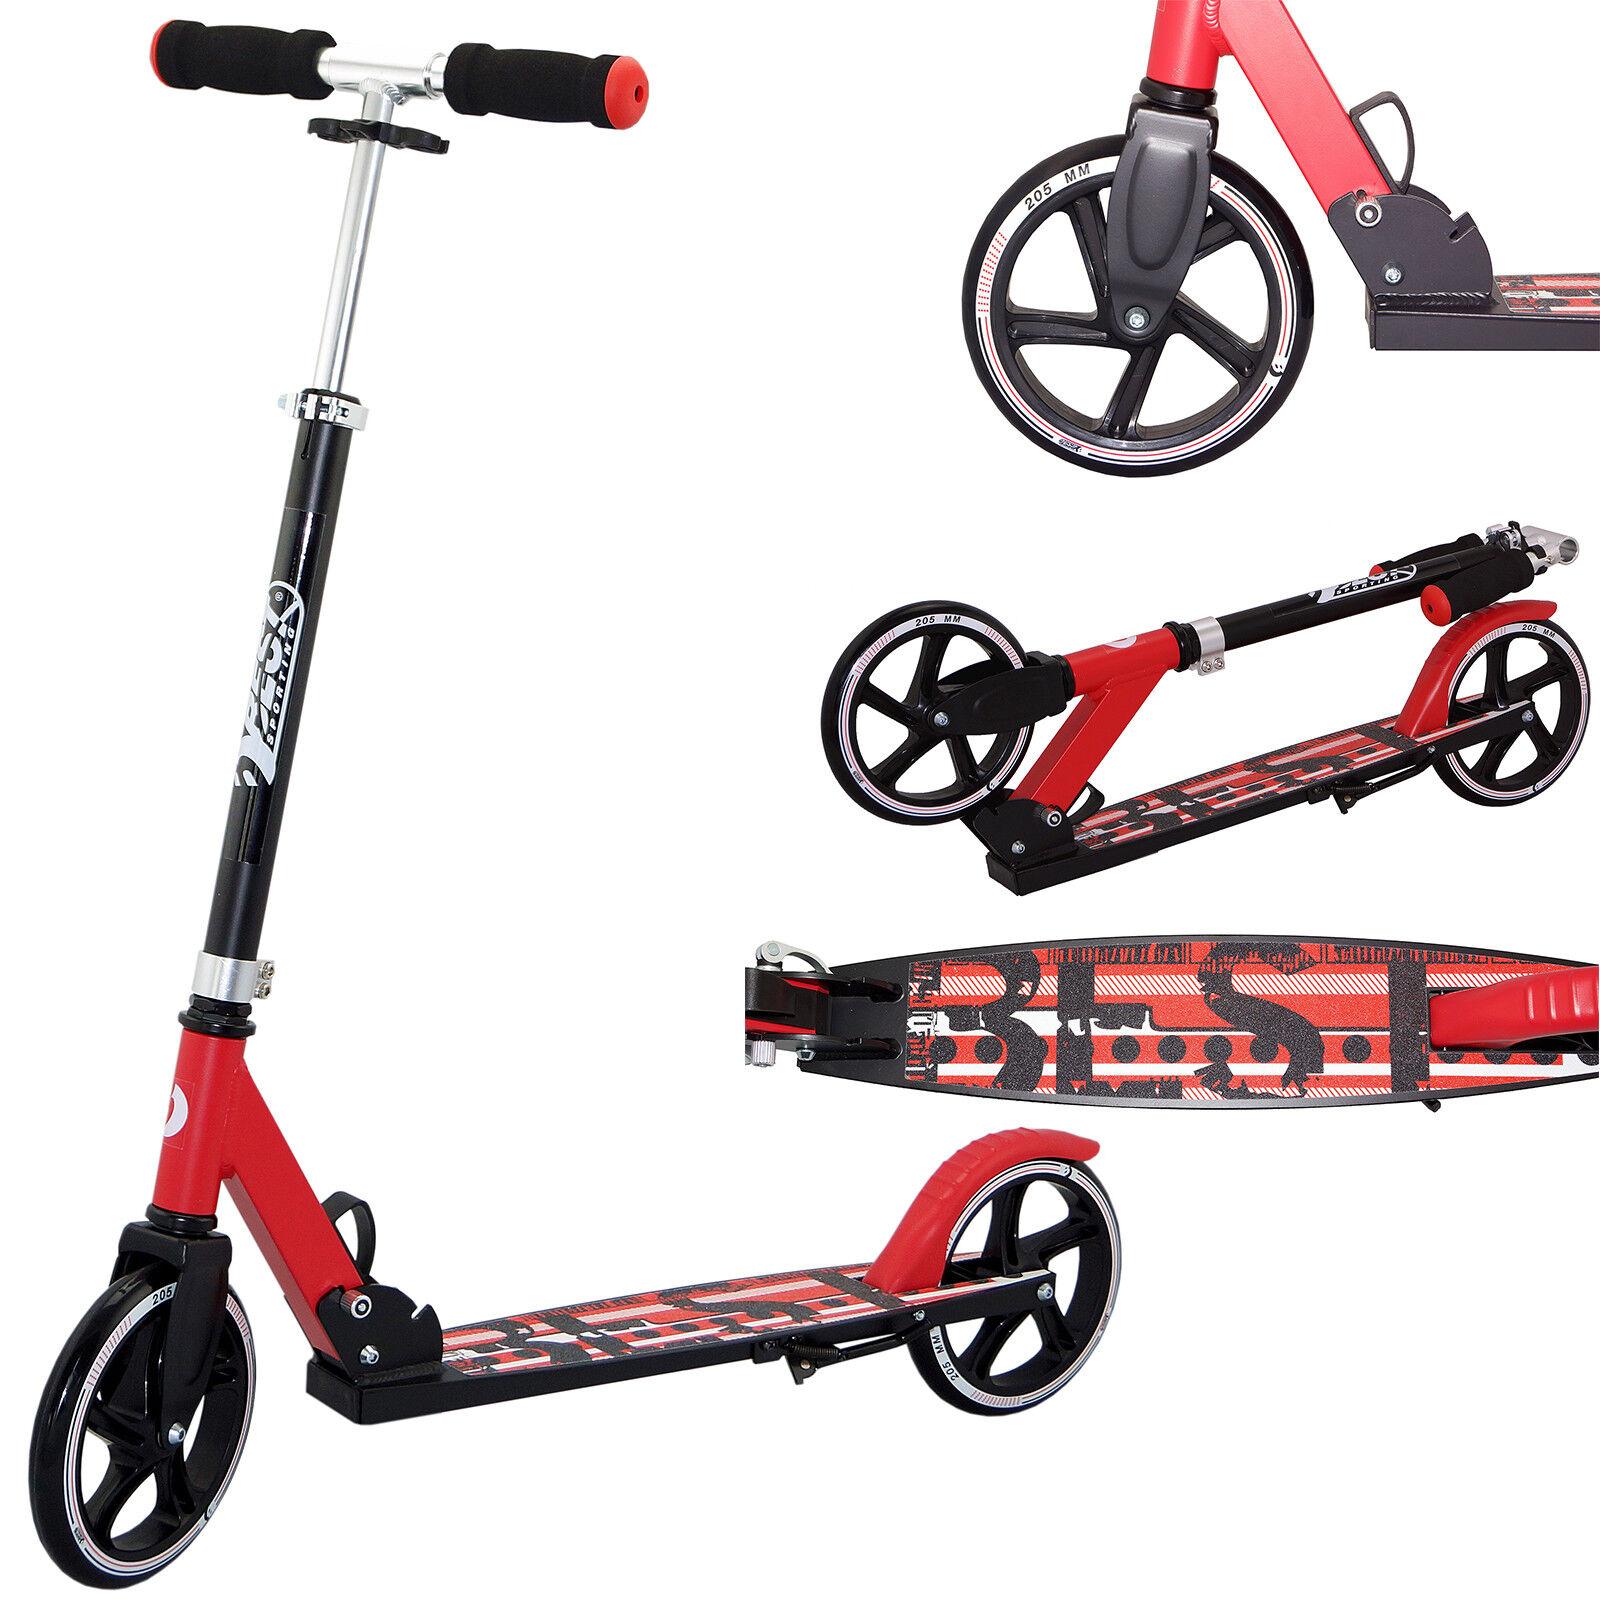 Best Sporting Scooter 205er Ruolo, Pieghevole Monopattino per Bambino